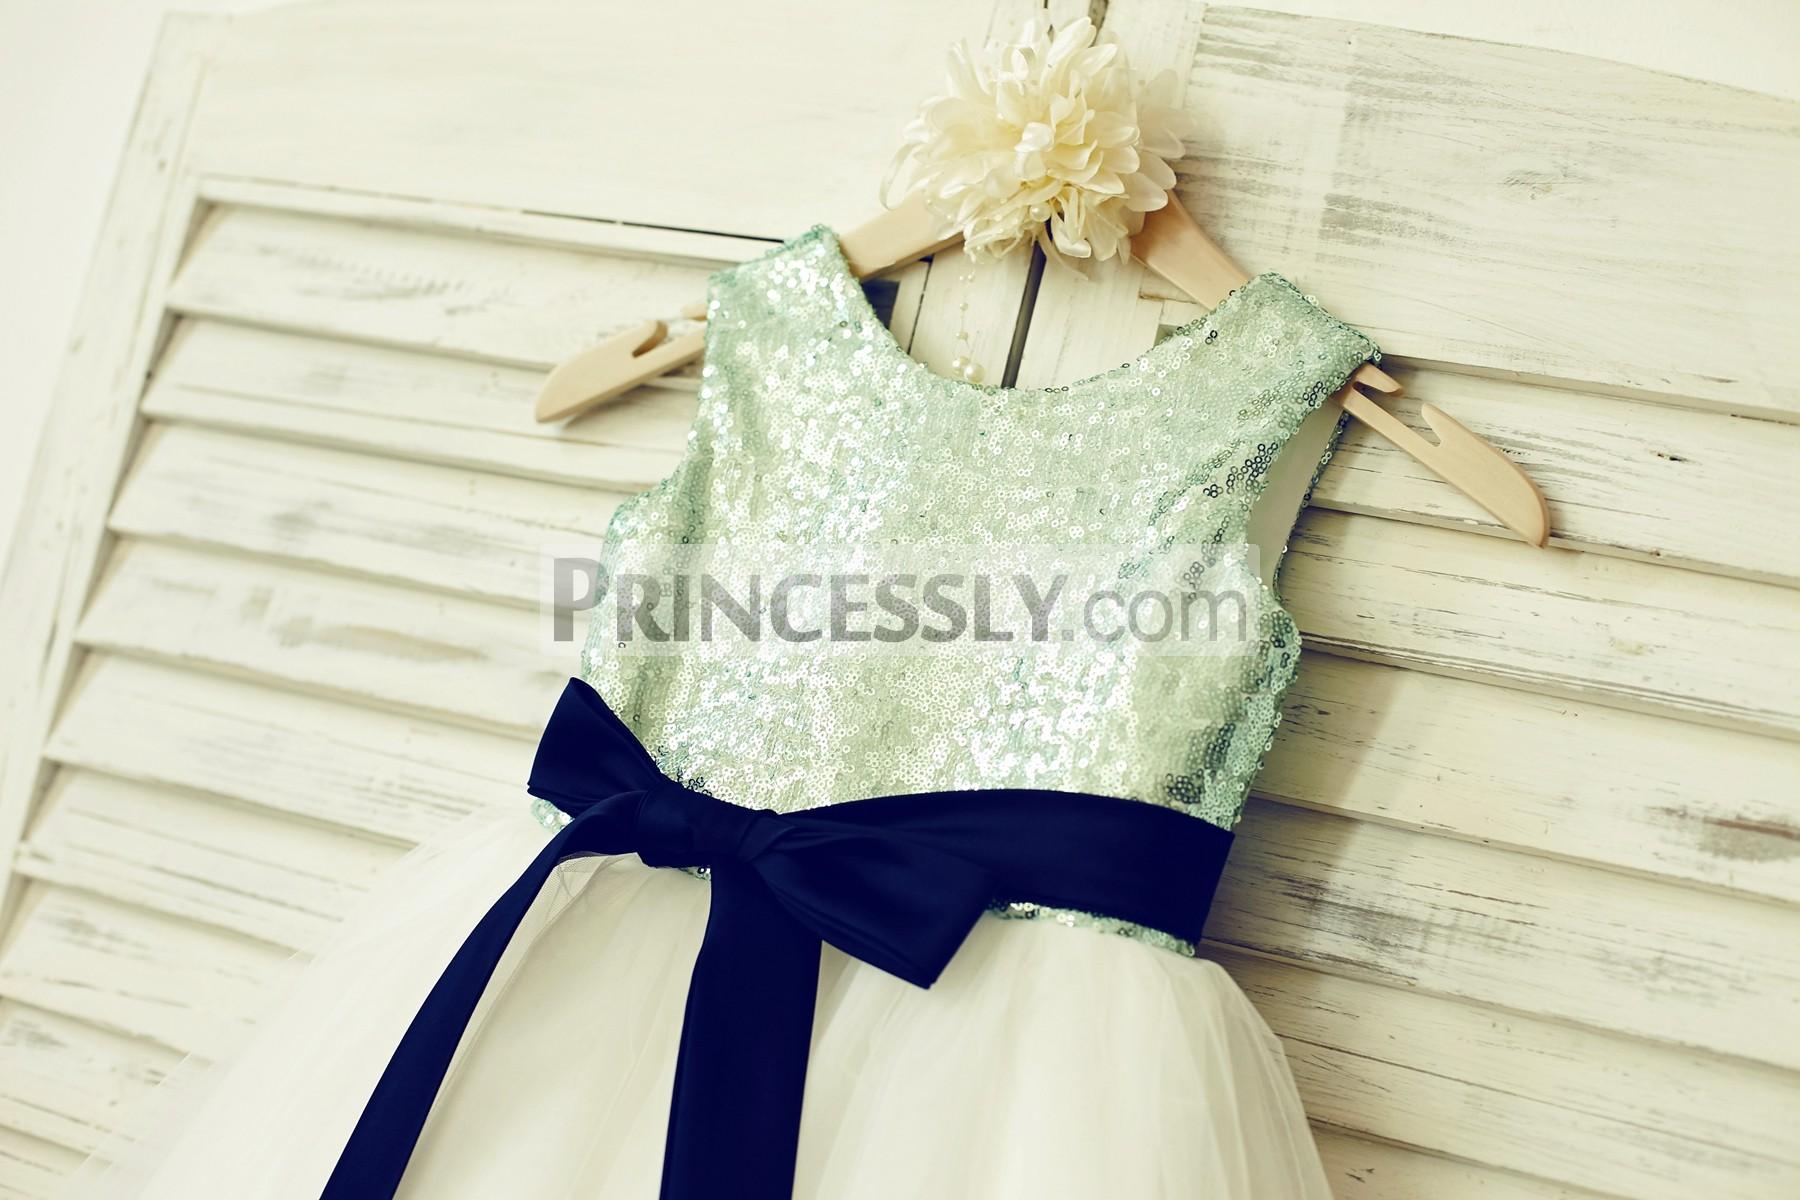 Scoop neckline sleeveless mint green sequin bodice